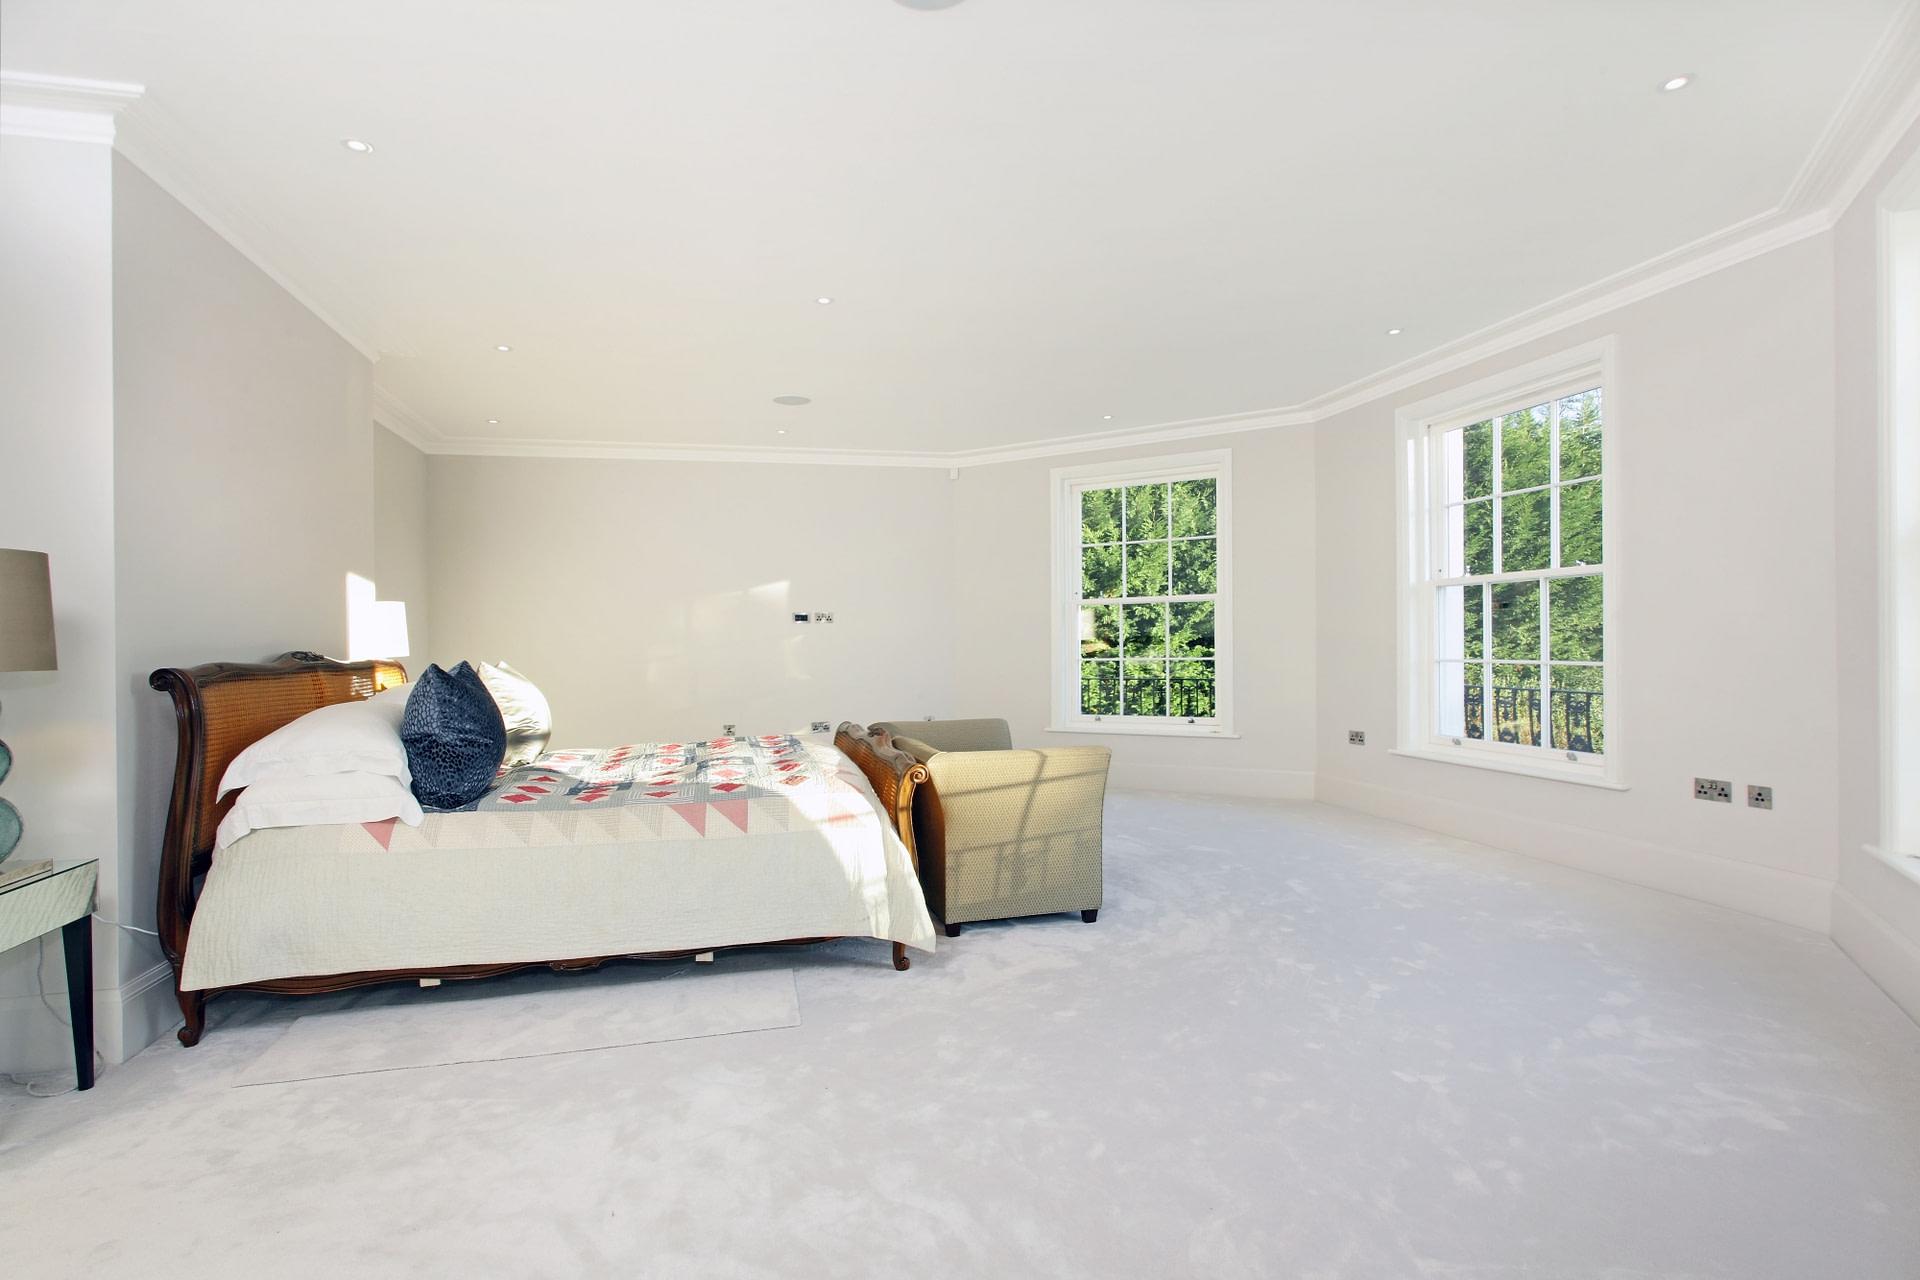 31 Holmewood Ridge bedroom